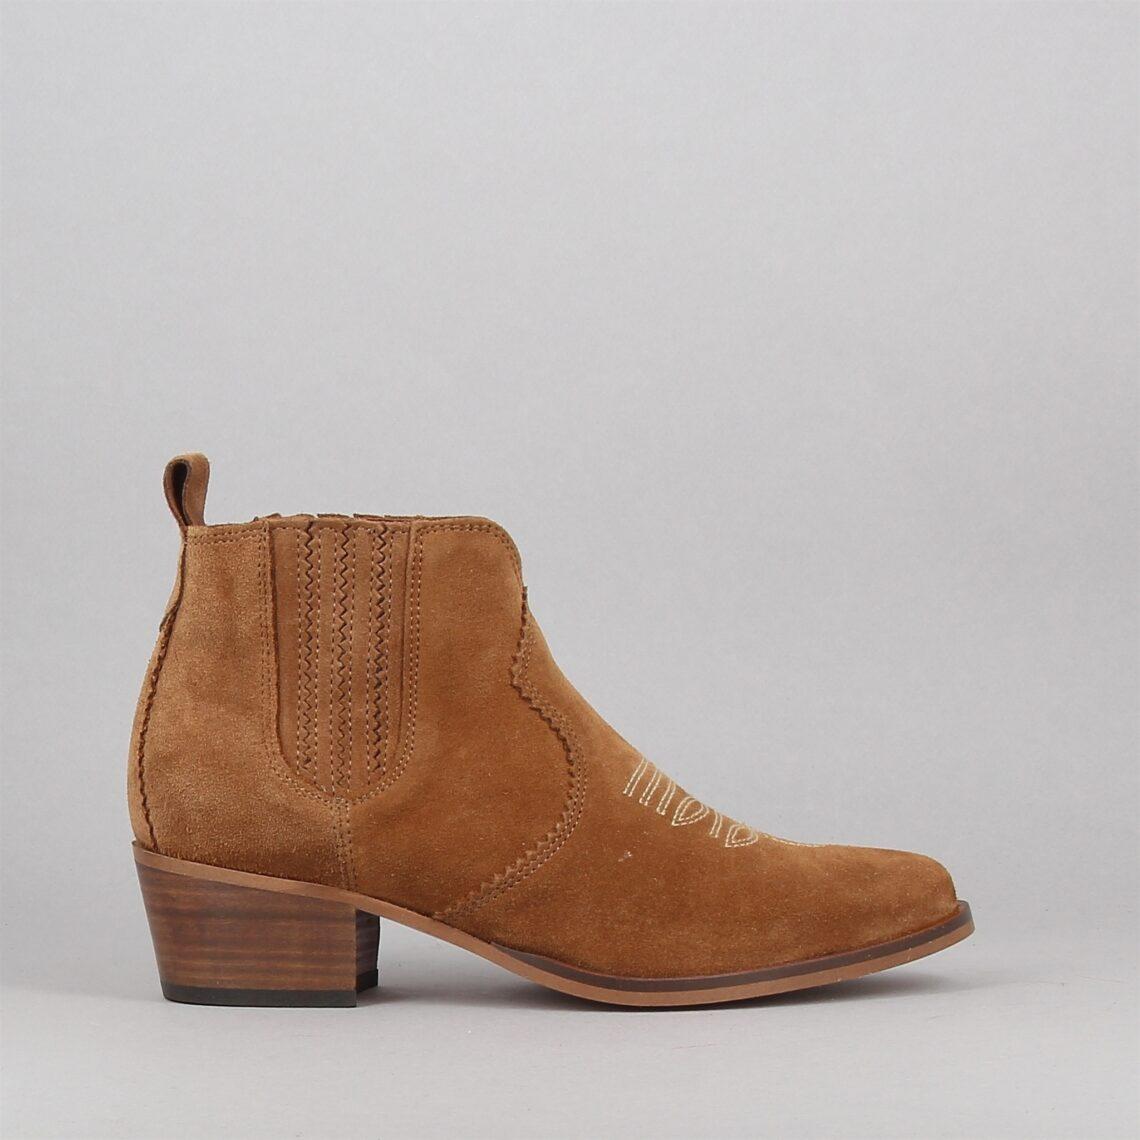 polly-boots-camel-178929666-0.jpg